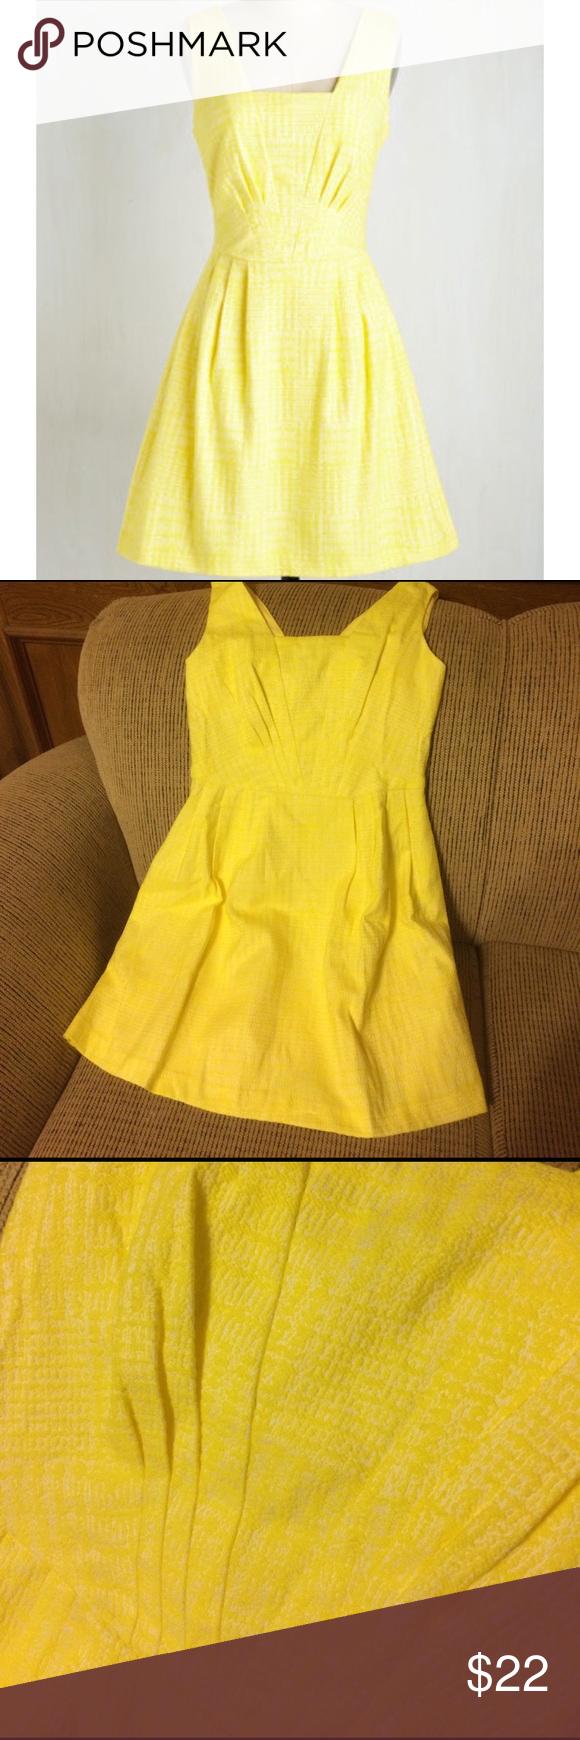 Png light yellow dresses